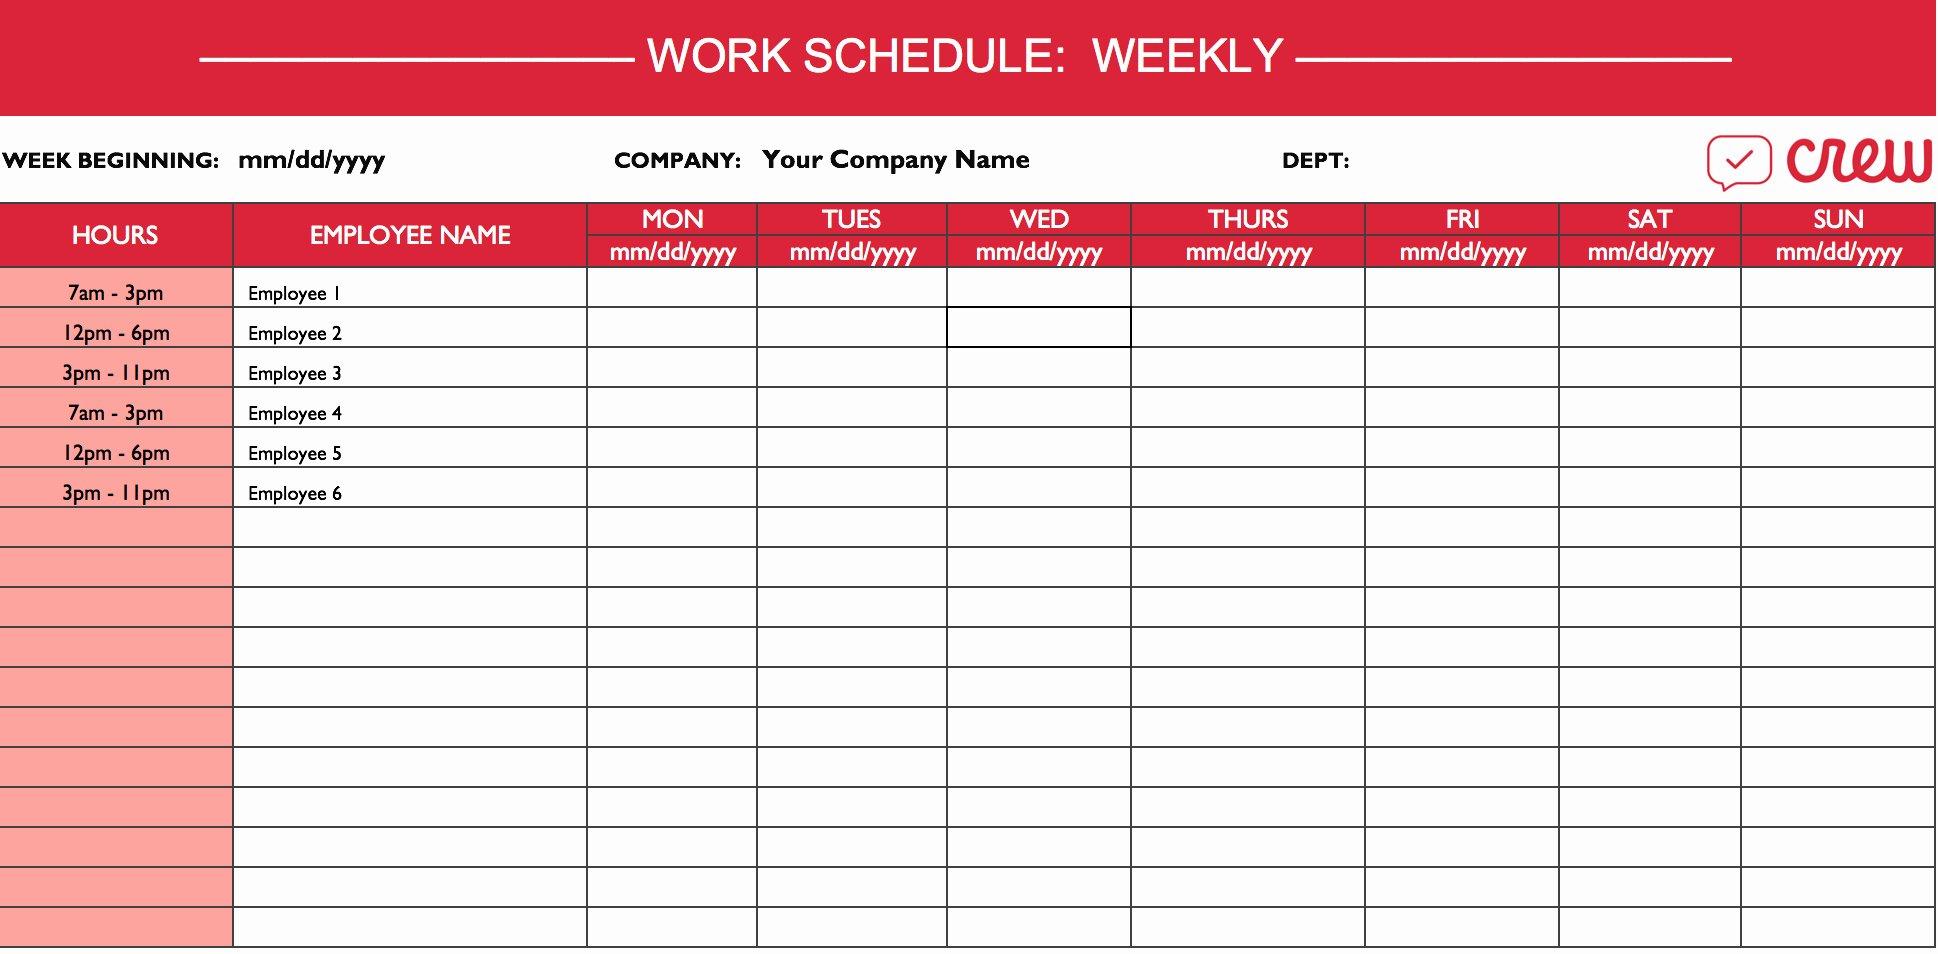 Weekly Work Schedule Template Free Beautiful Employee Work Schedule Spreadsheet 2 Example Of Spreadshee